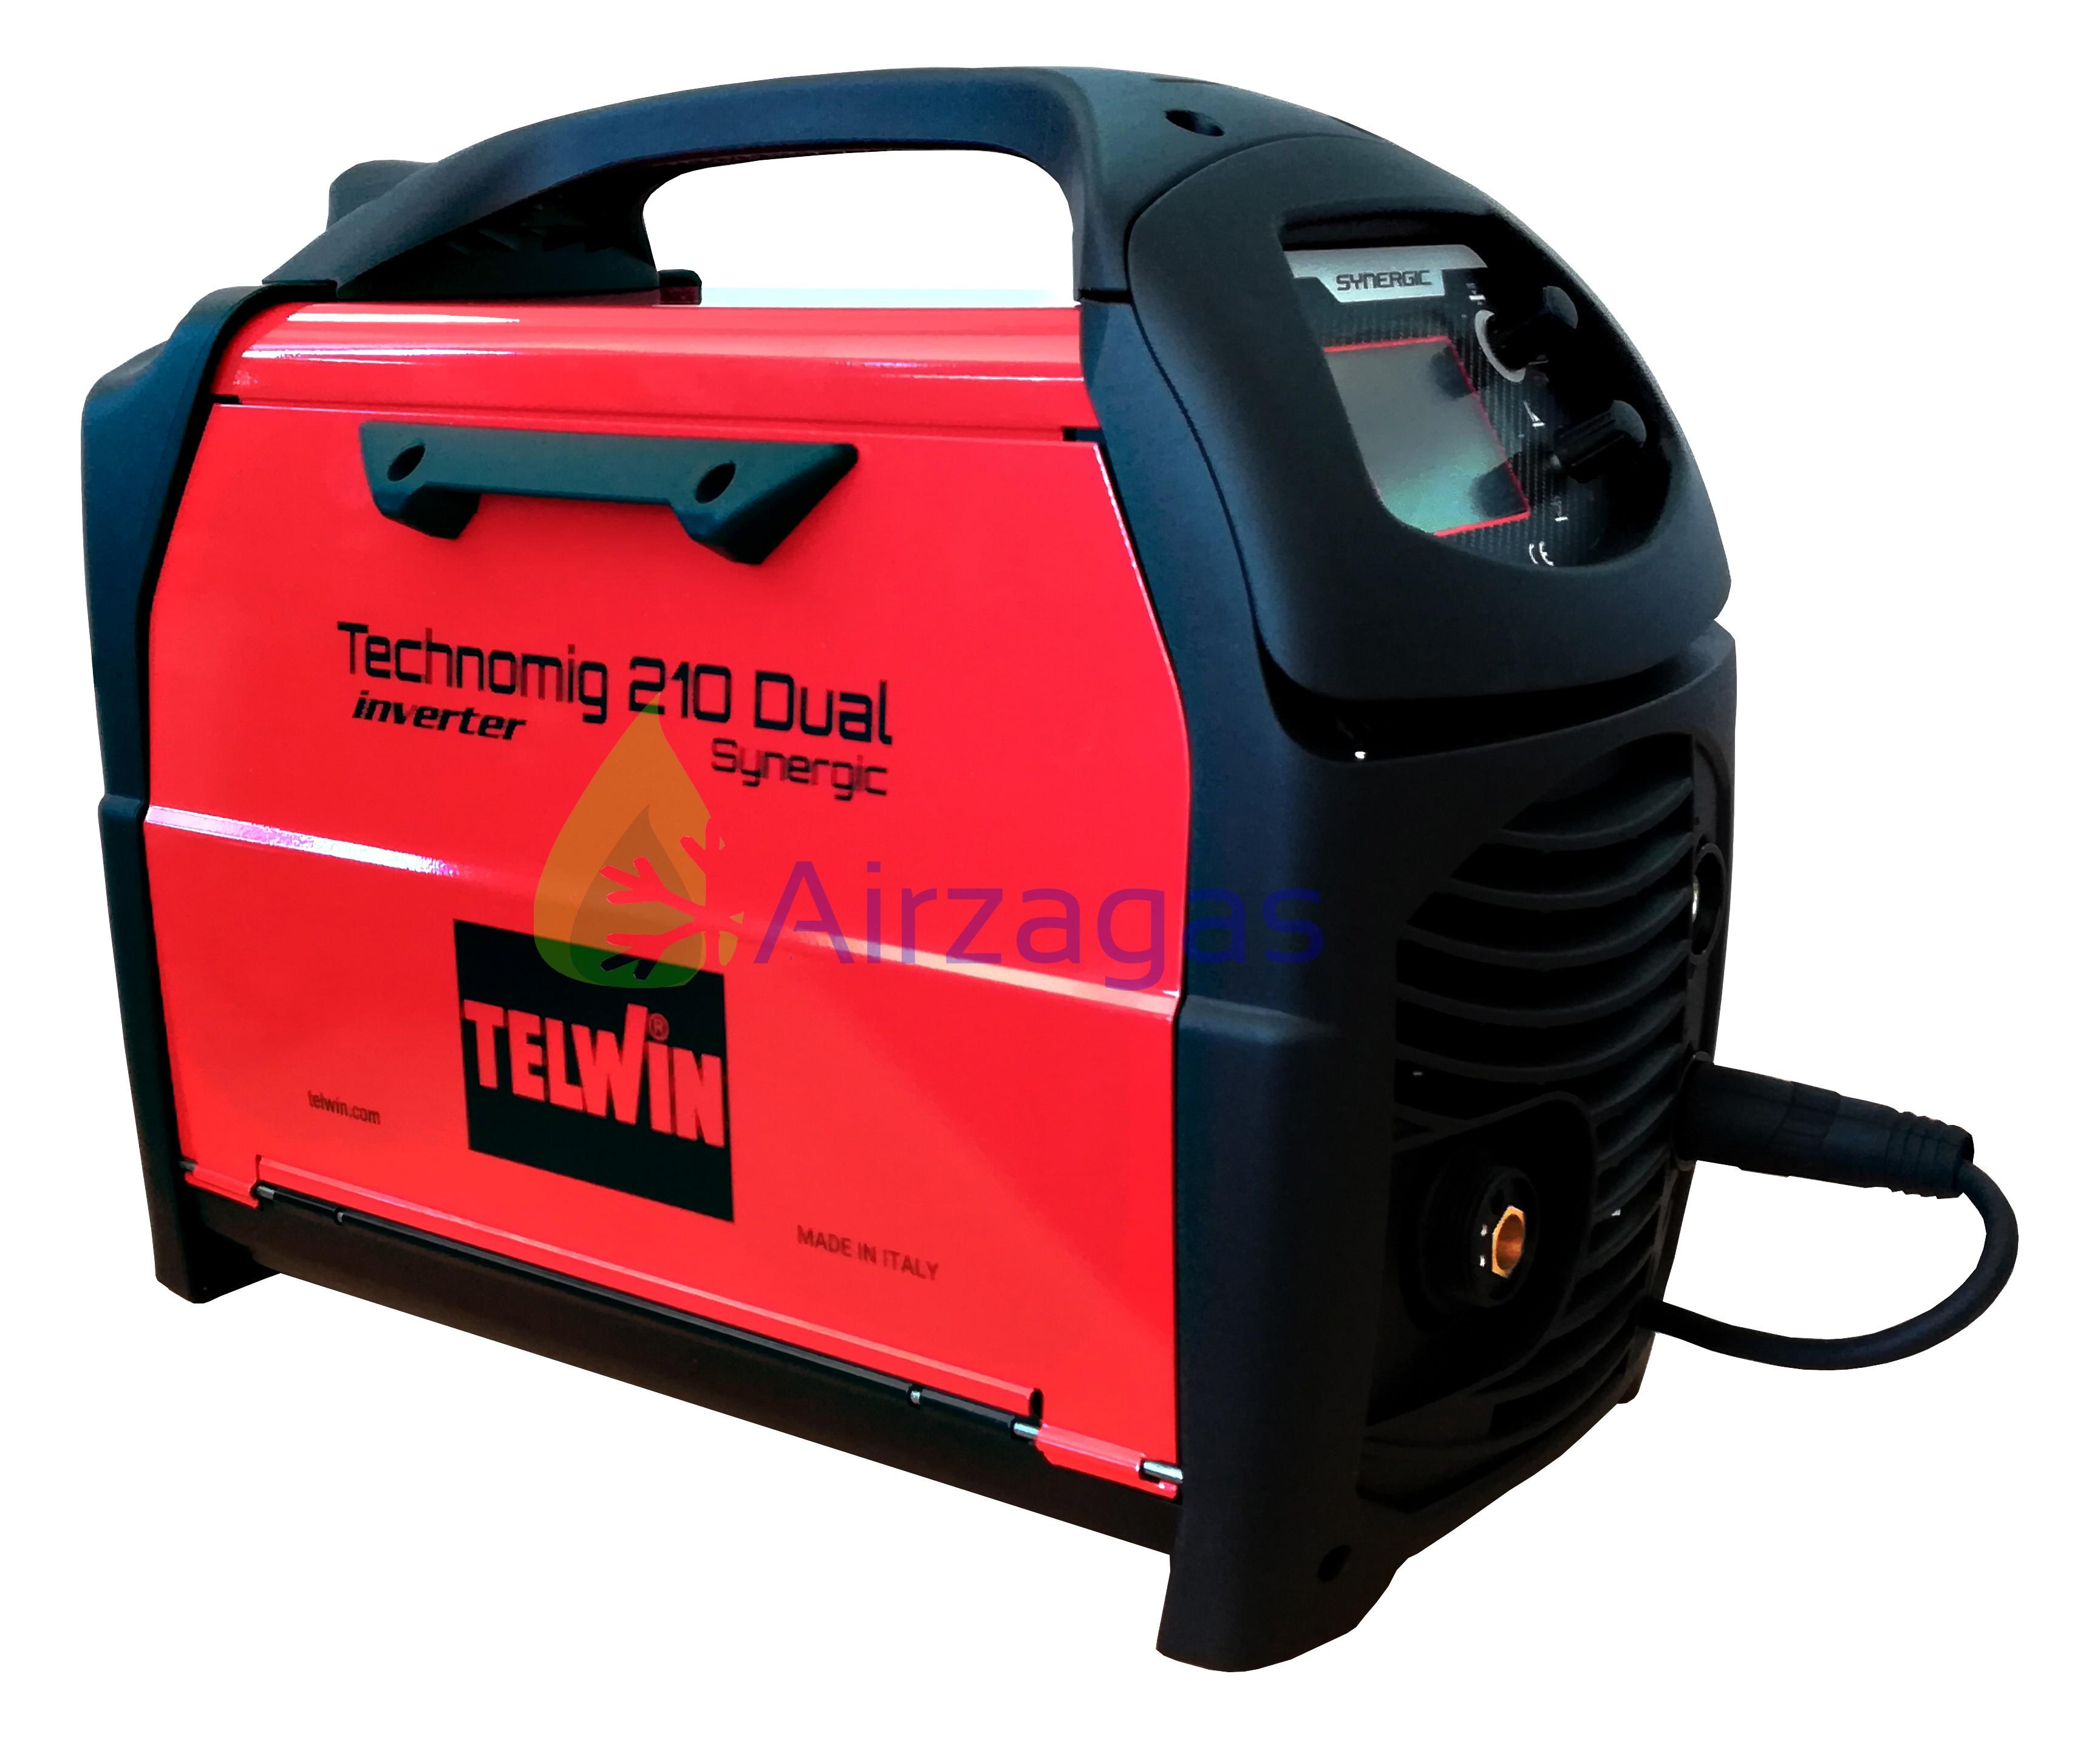 TELWIN NUEVA TECHNOMIG 210 DUAL SYNERGIC